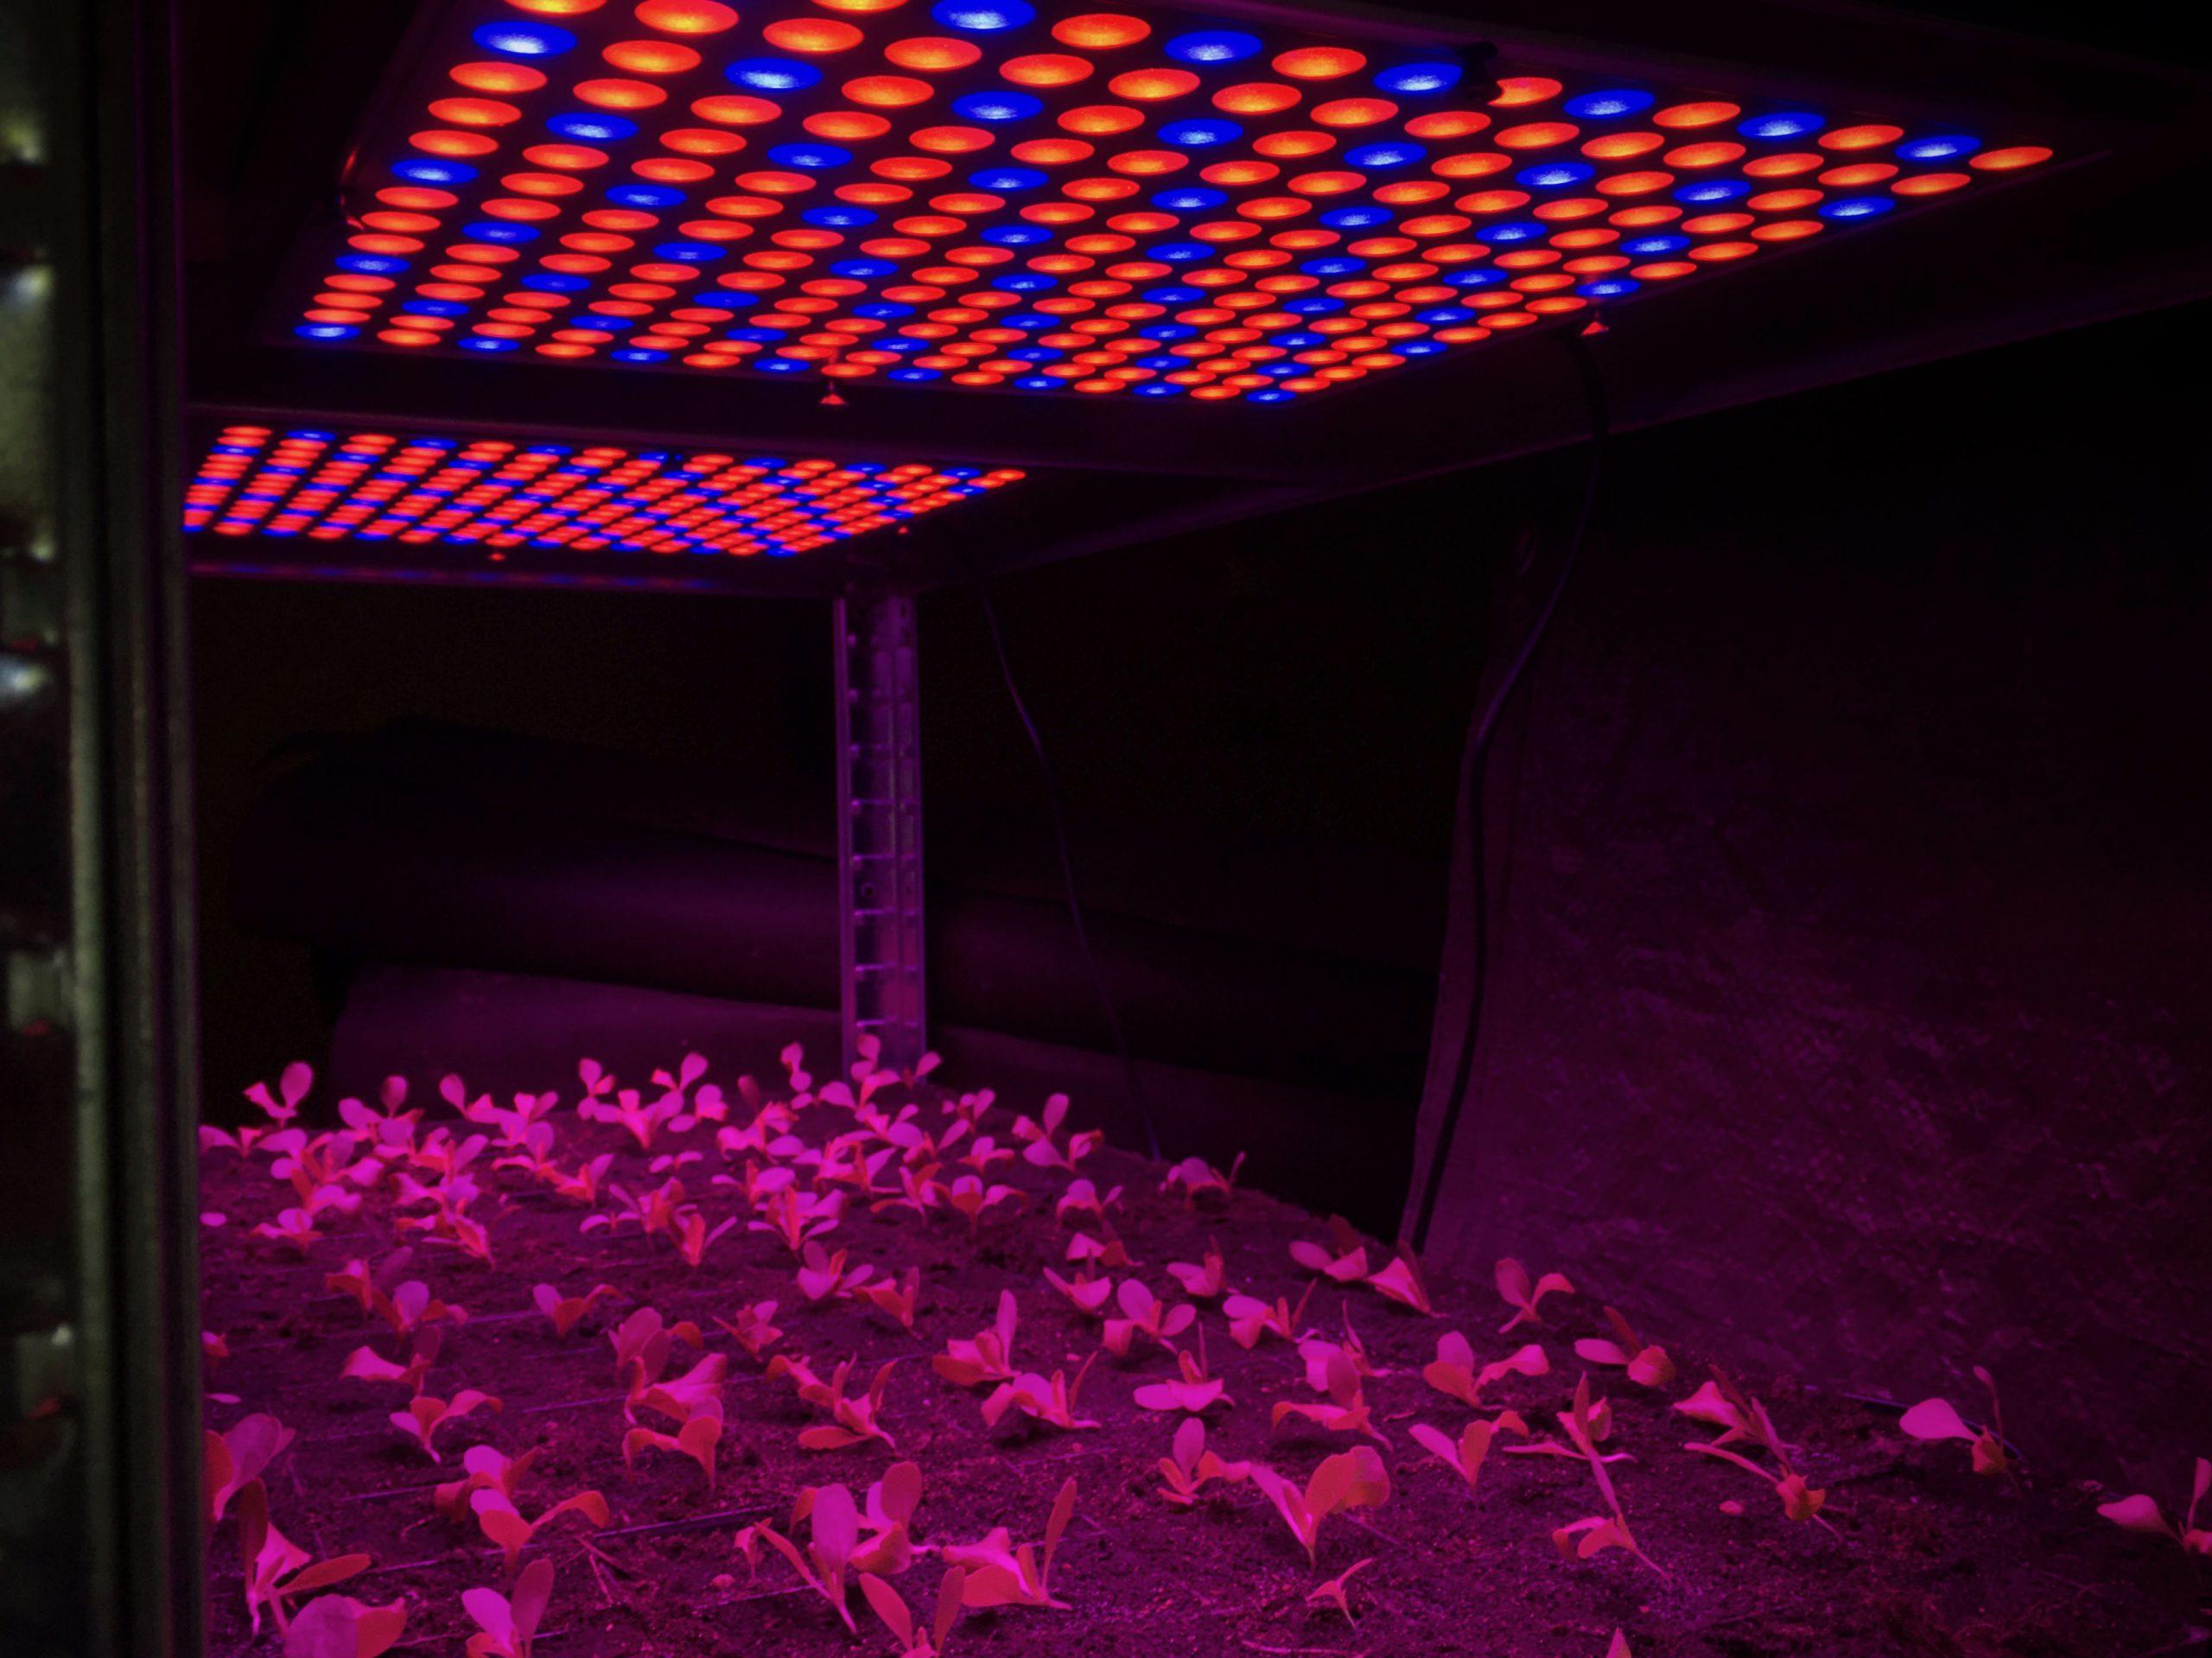 Lumeri SQ100_LI LED växtbelysningspaneler